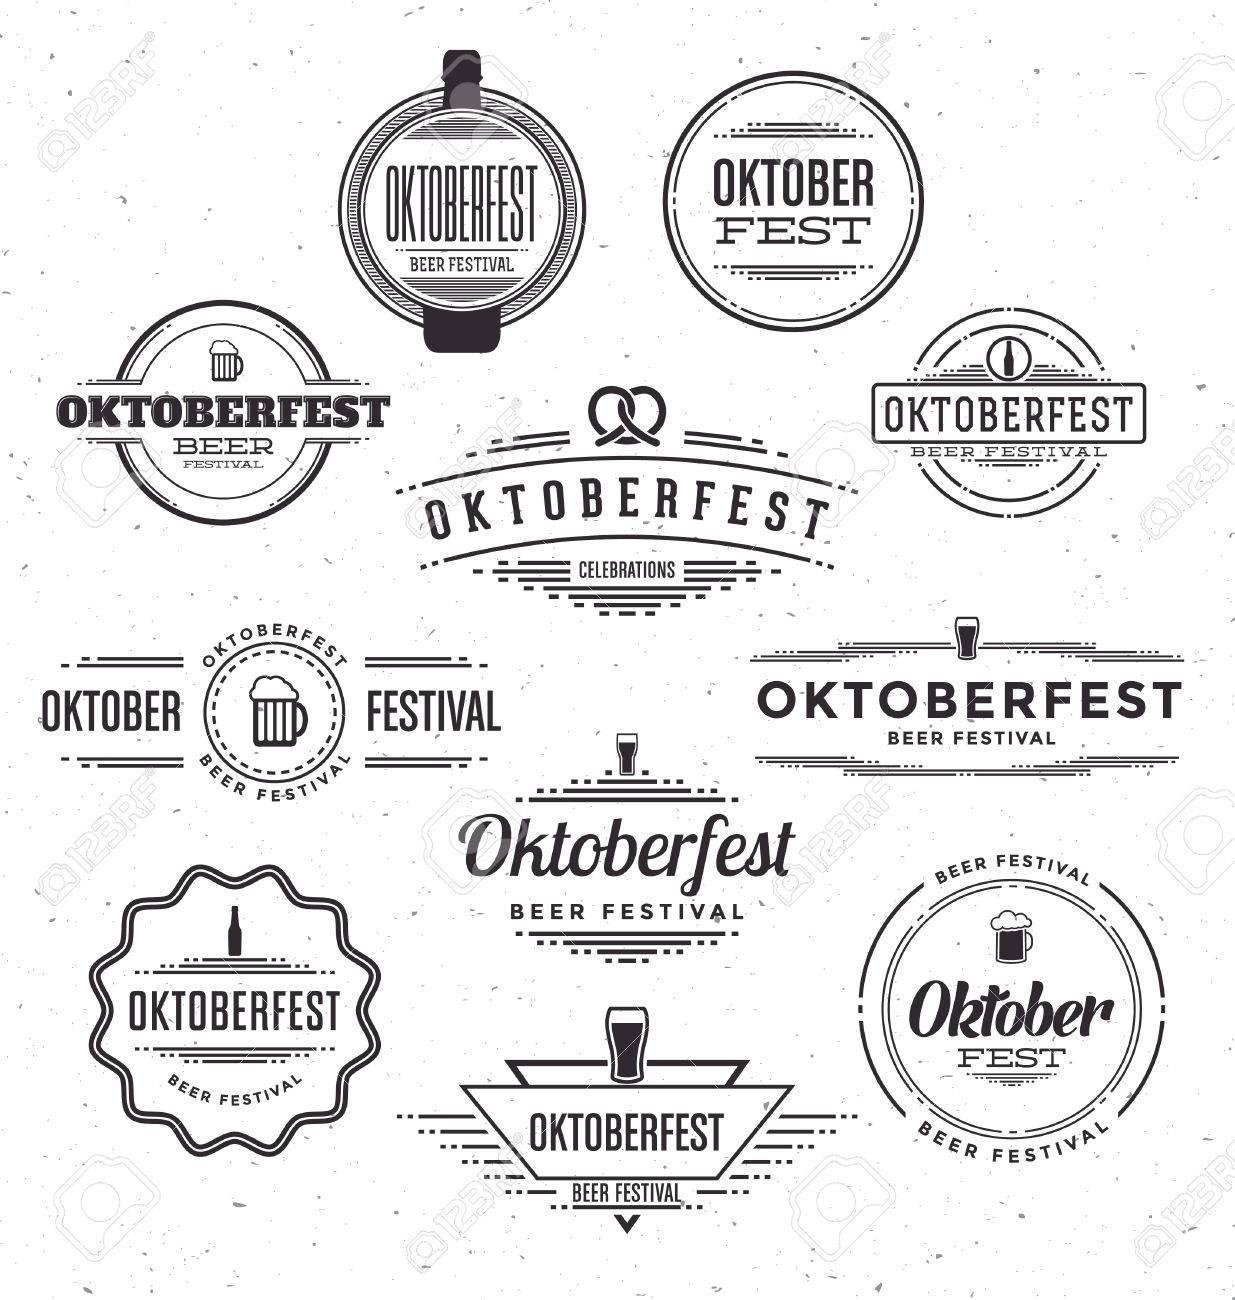 Set of Oktoberfest beer festival celebration retro typographic design templates - Textured vintage style background - 45168201